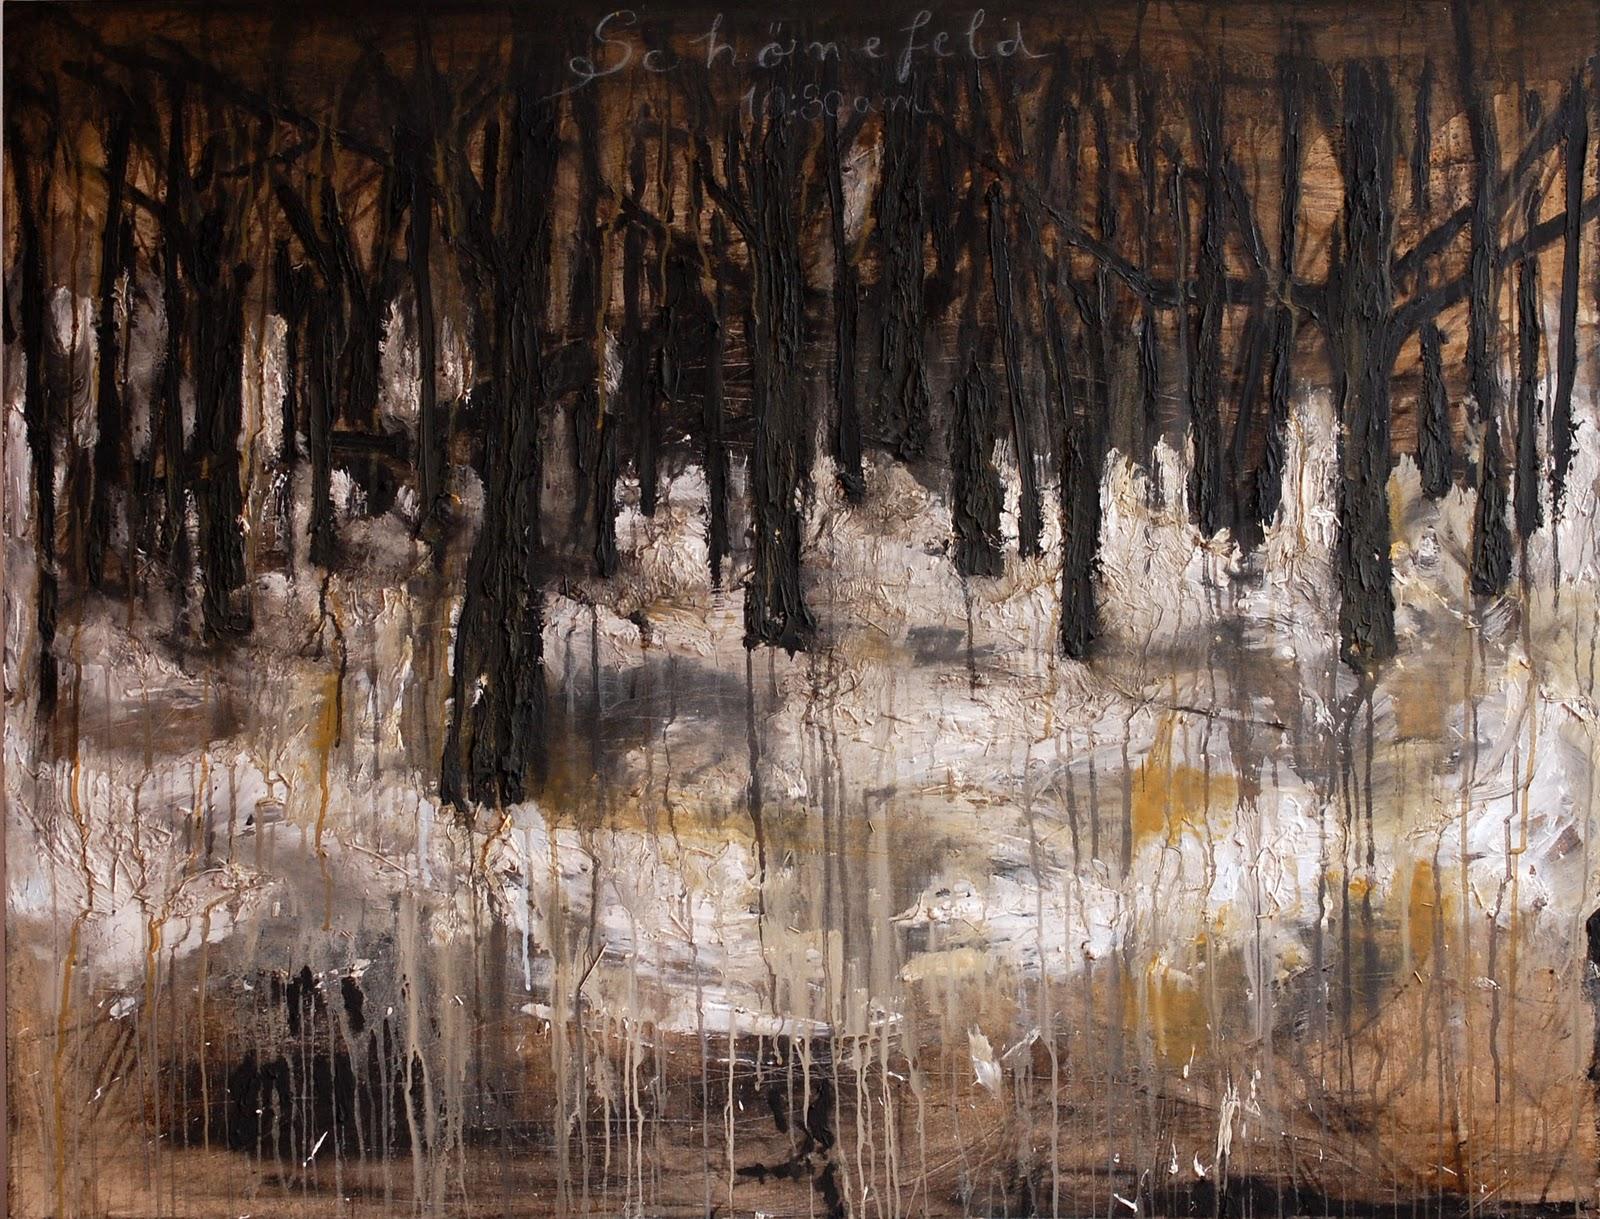 Cosmin Fruntes Schonefeld  mixed media on canvas  100x130 cm